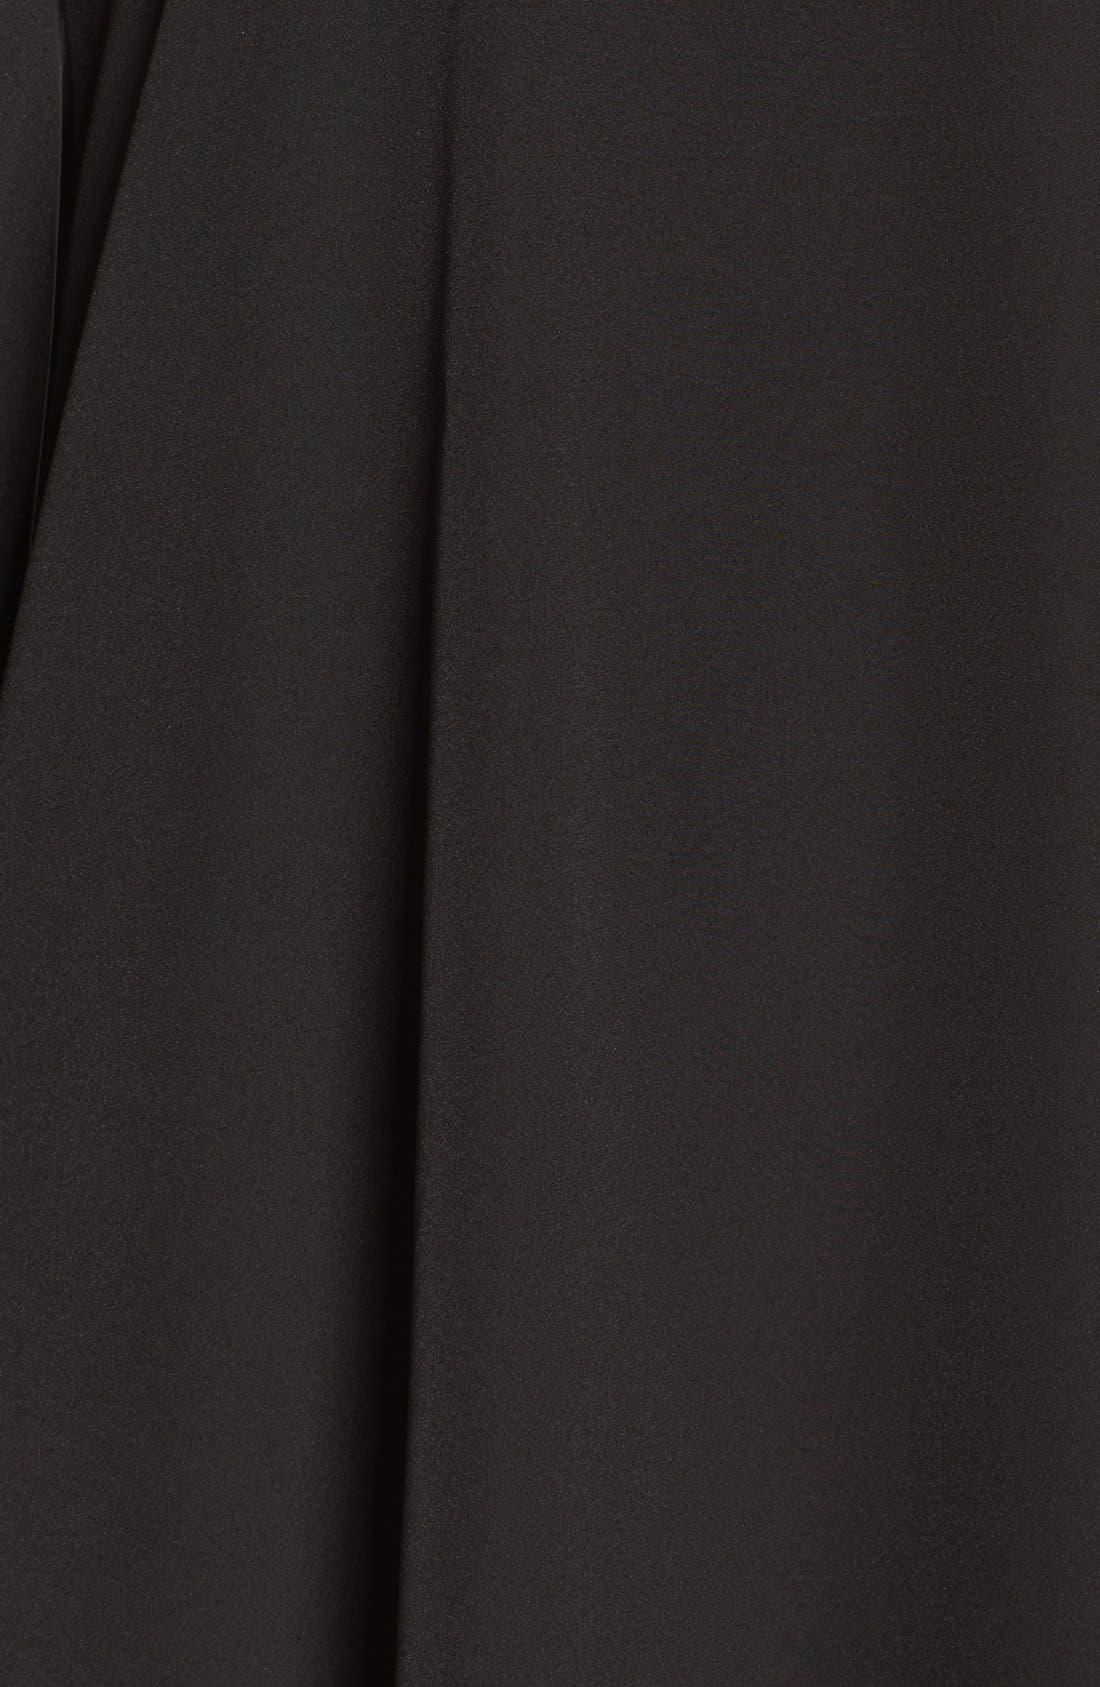 A BY AMANDA,                             Luella One-Shoulder Dress,                             Alternate thumbnail 6, color,                             001